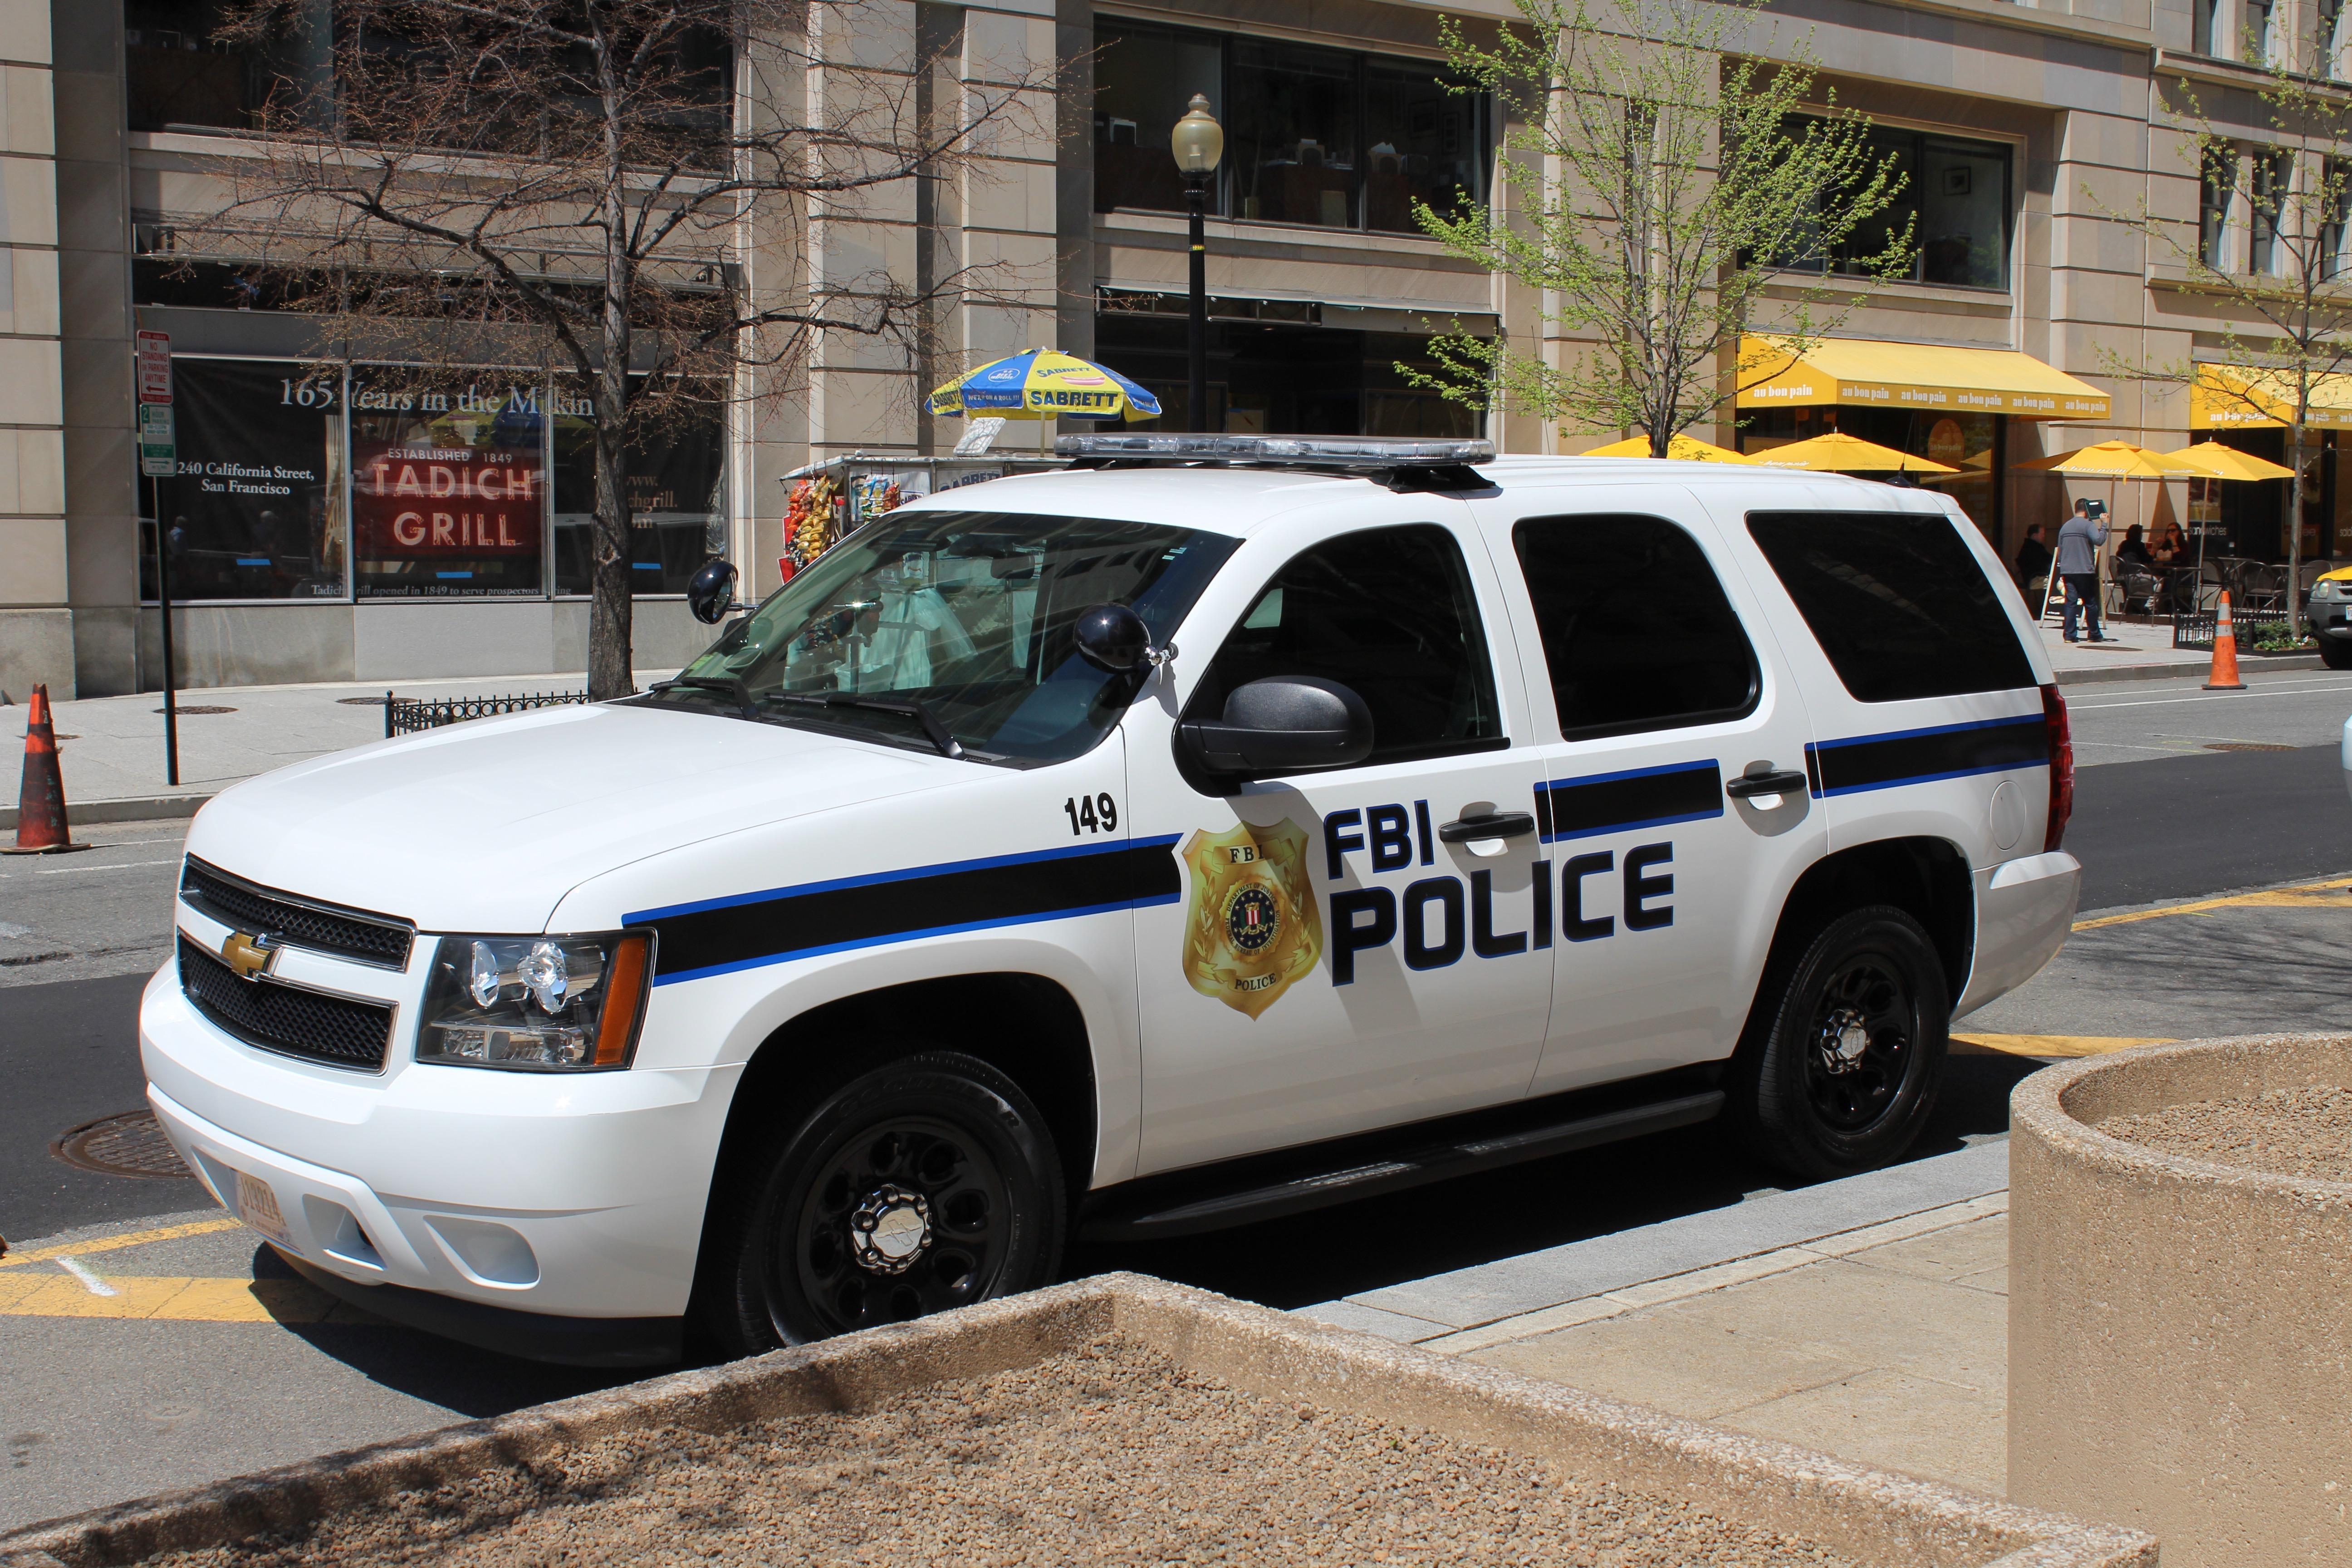 FBI Police Chevy Tahoe, Vehicle, Washington dc, Tahoe, Police, HQ Photo